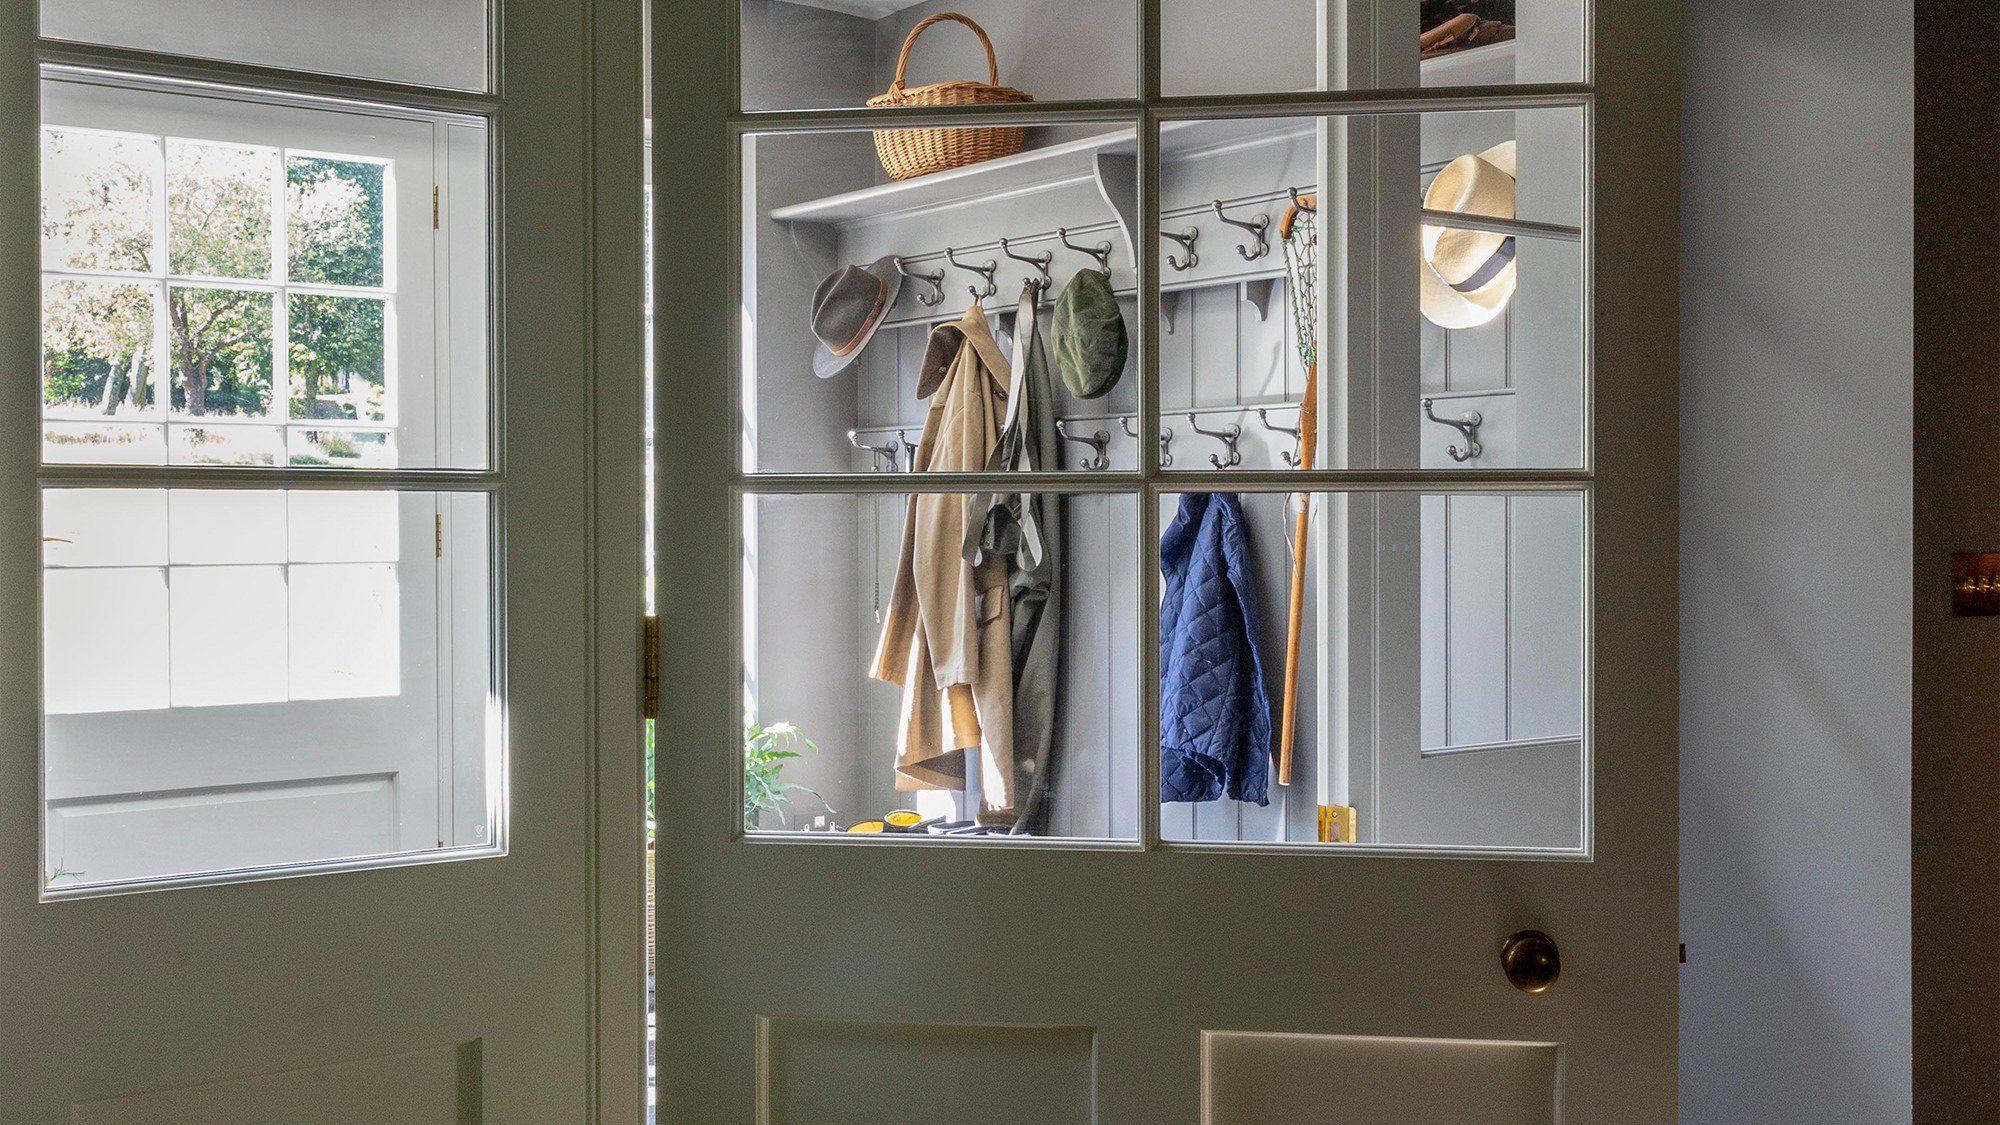 Country house boot room door detail